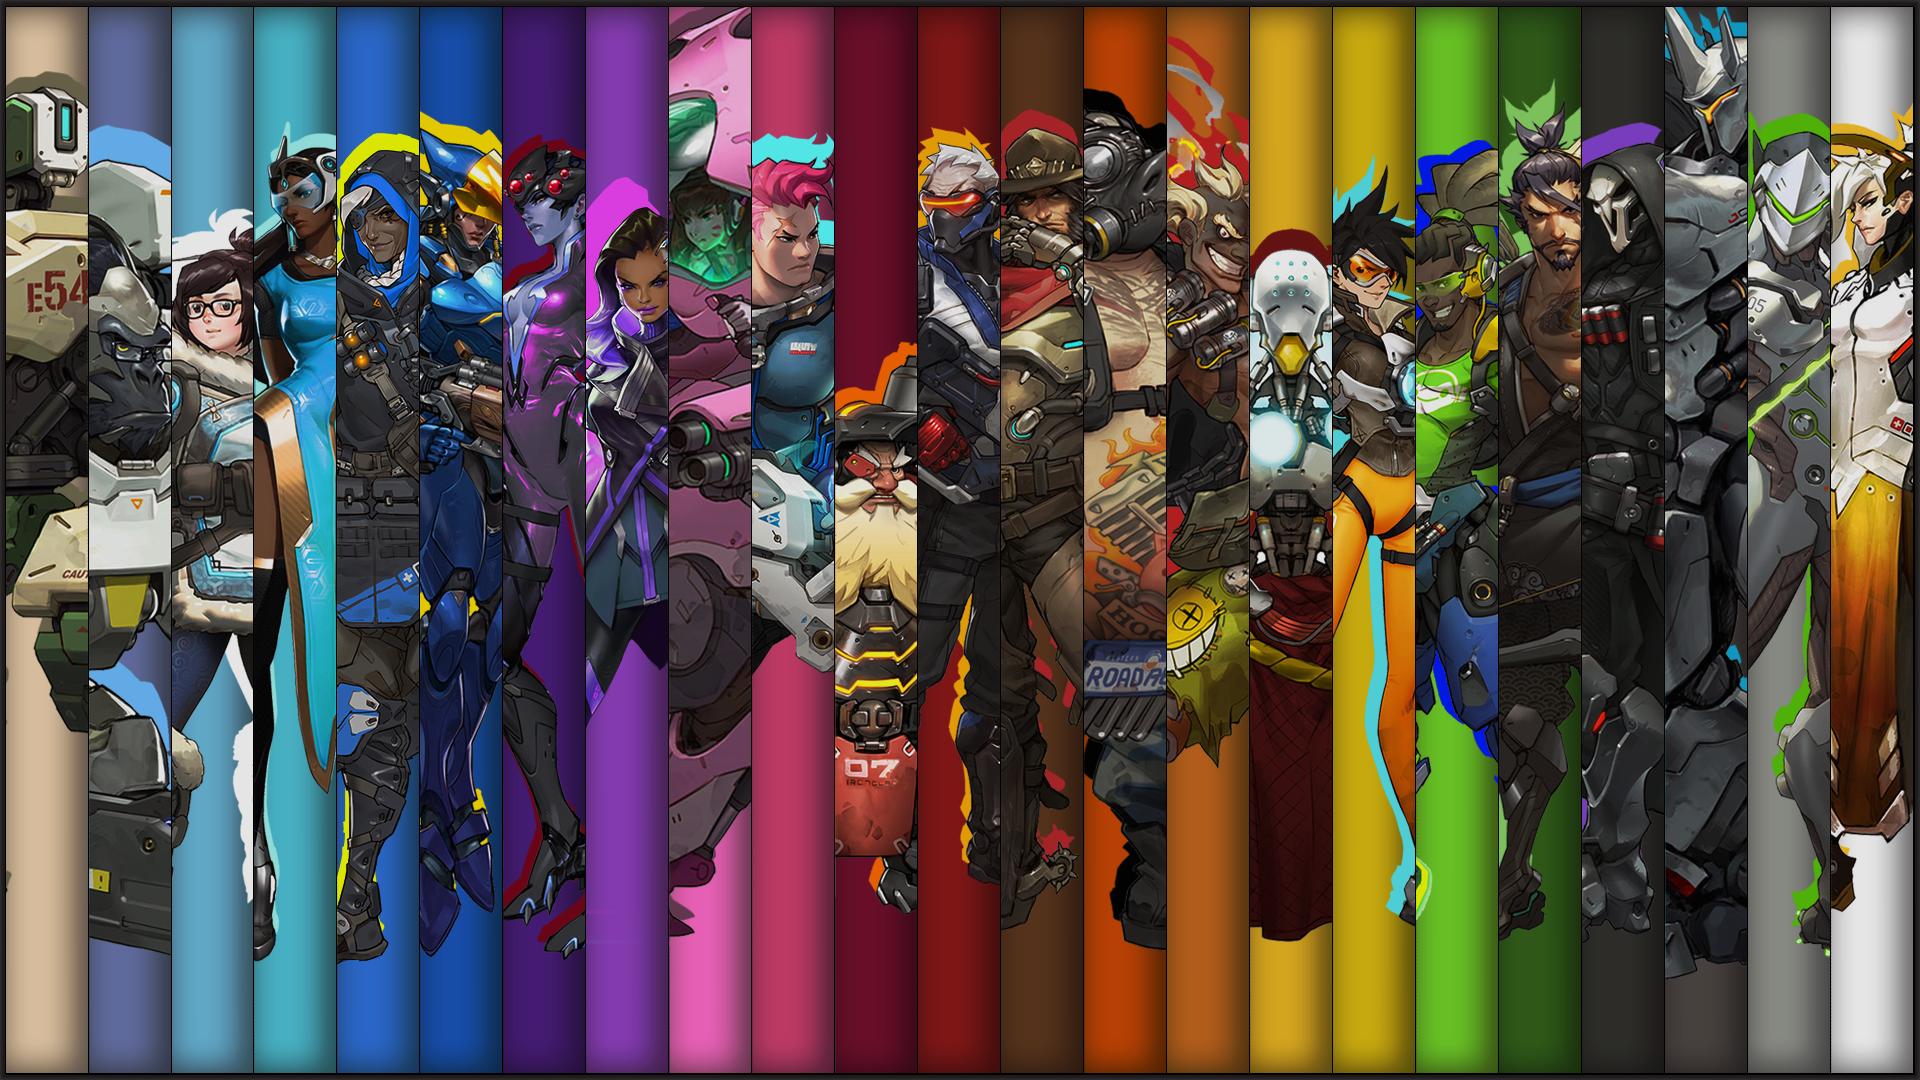 Dual Monitor Wallpaper Overwatch: Overwatch HD Обои